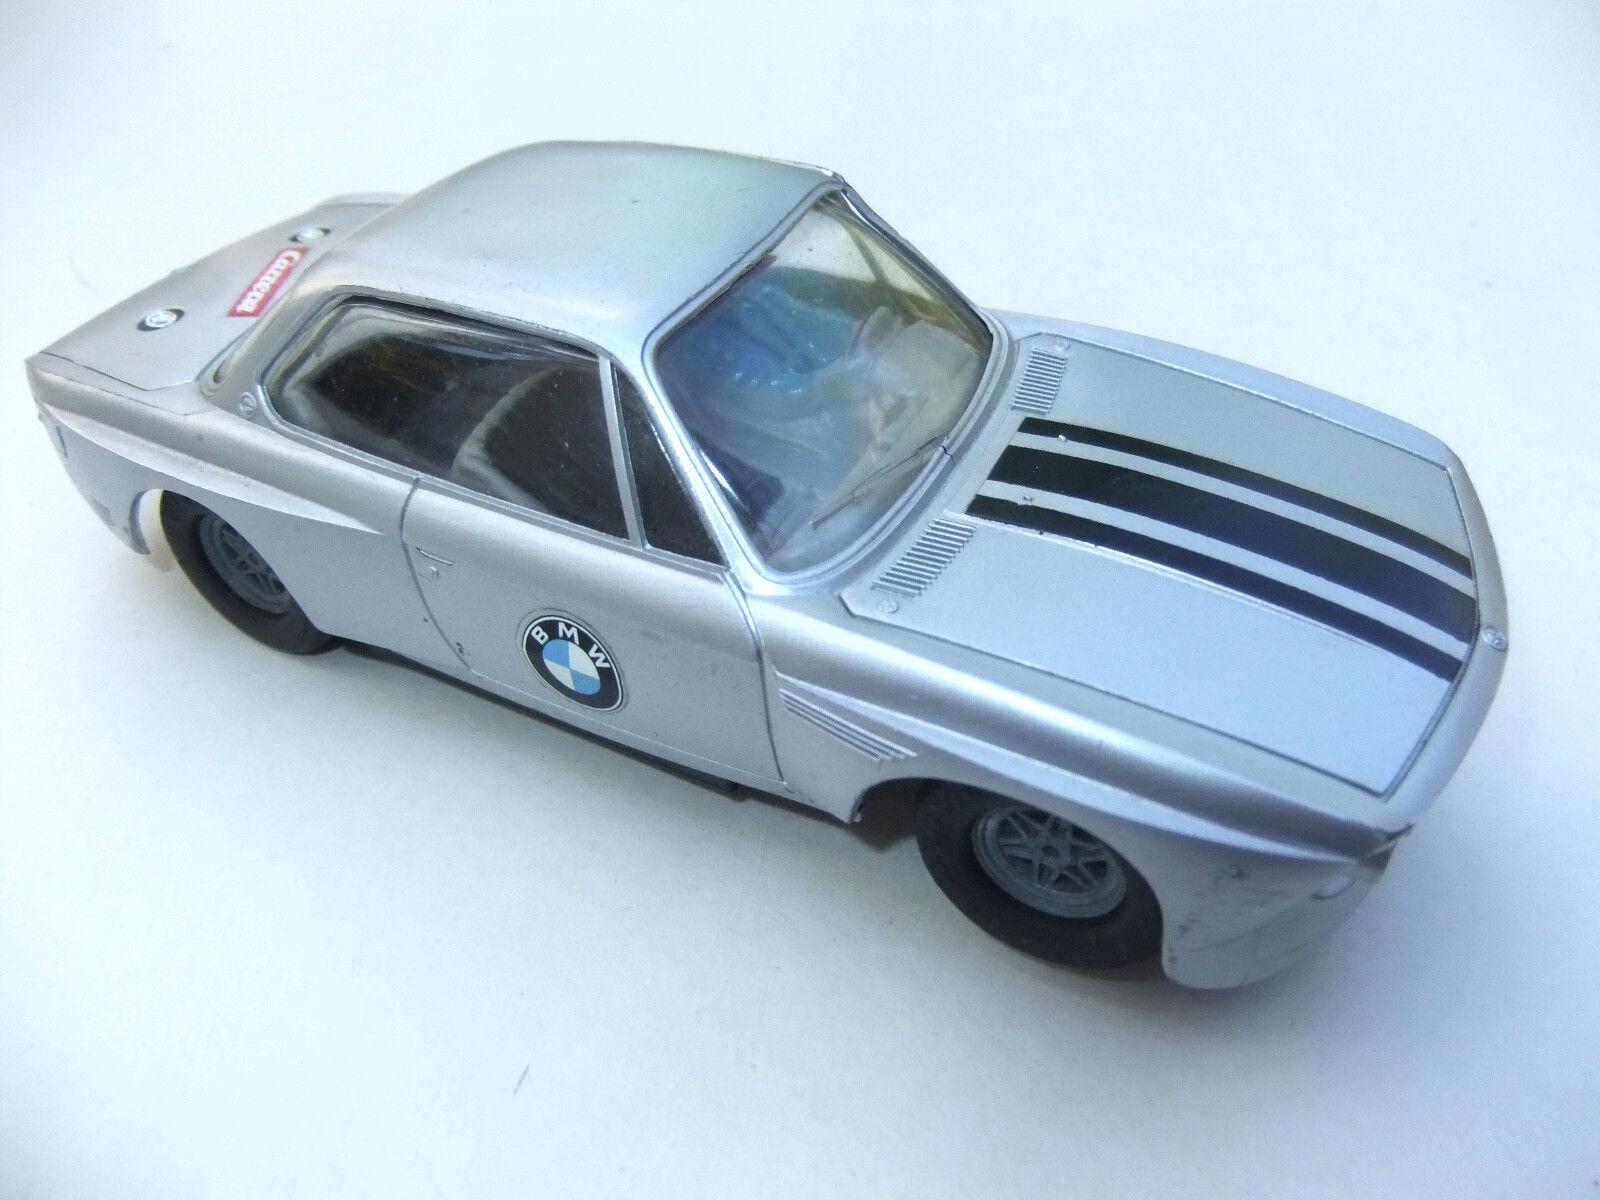 BMW 3.0 CSI  Carrera  1 32    1594  | Sonderangebot